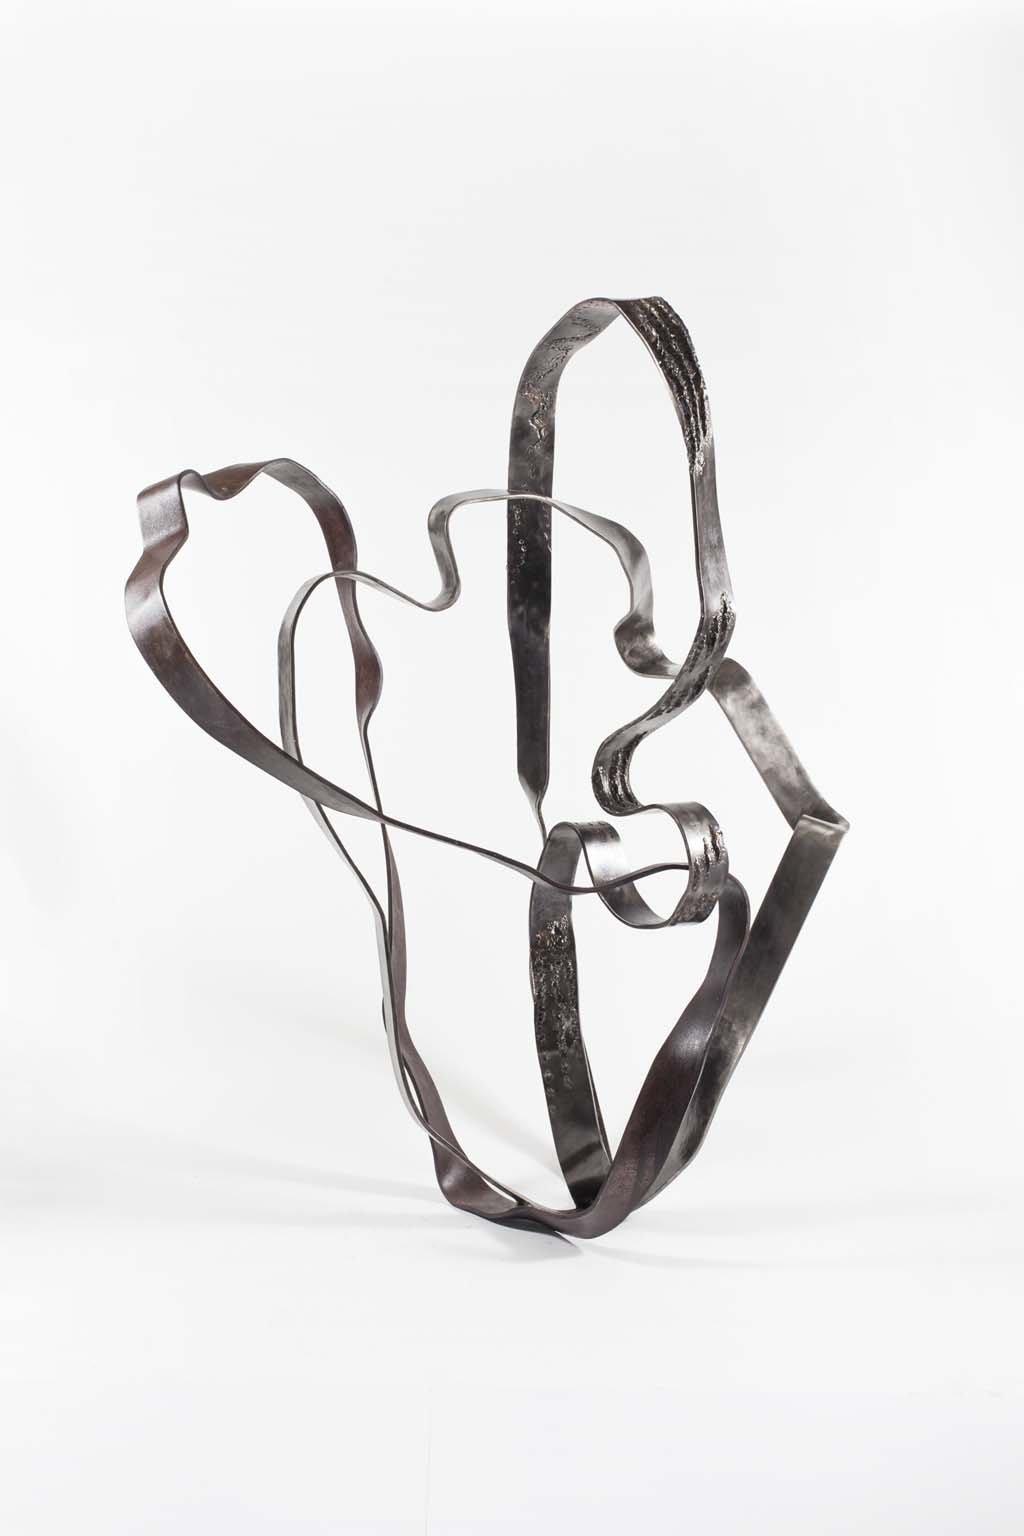 Oblivion IV |2016 | Iron & brass Sculpture| 152x100x90 cm | Rami Ater